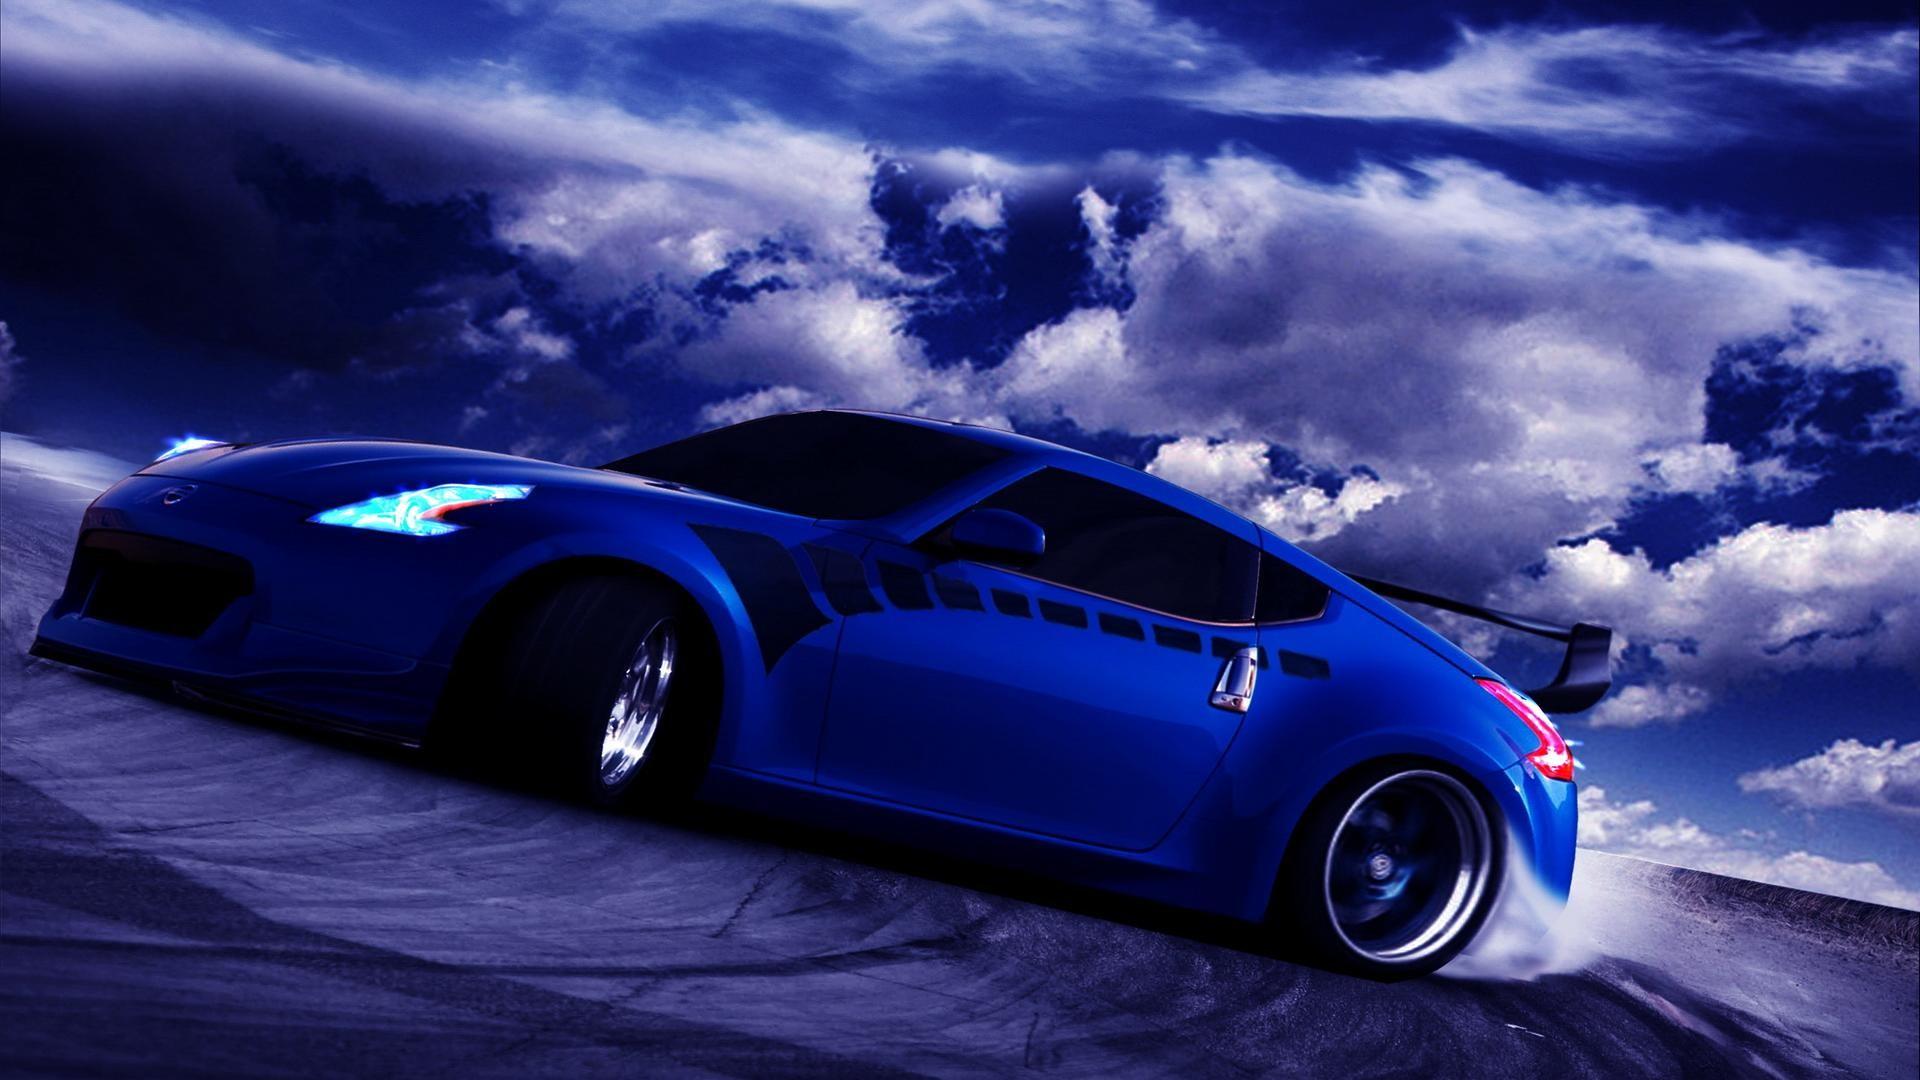 cool rich blue [1920×1080] via Classy Bro · Blue CarsCar WallpapersBeautiful  …